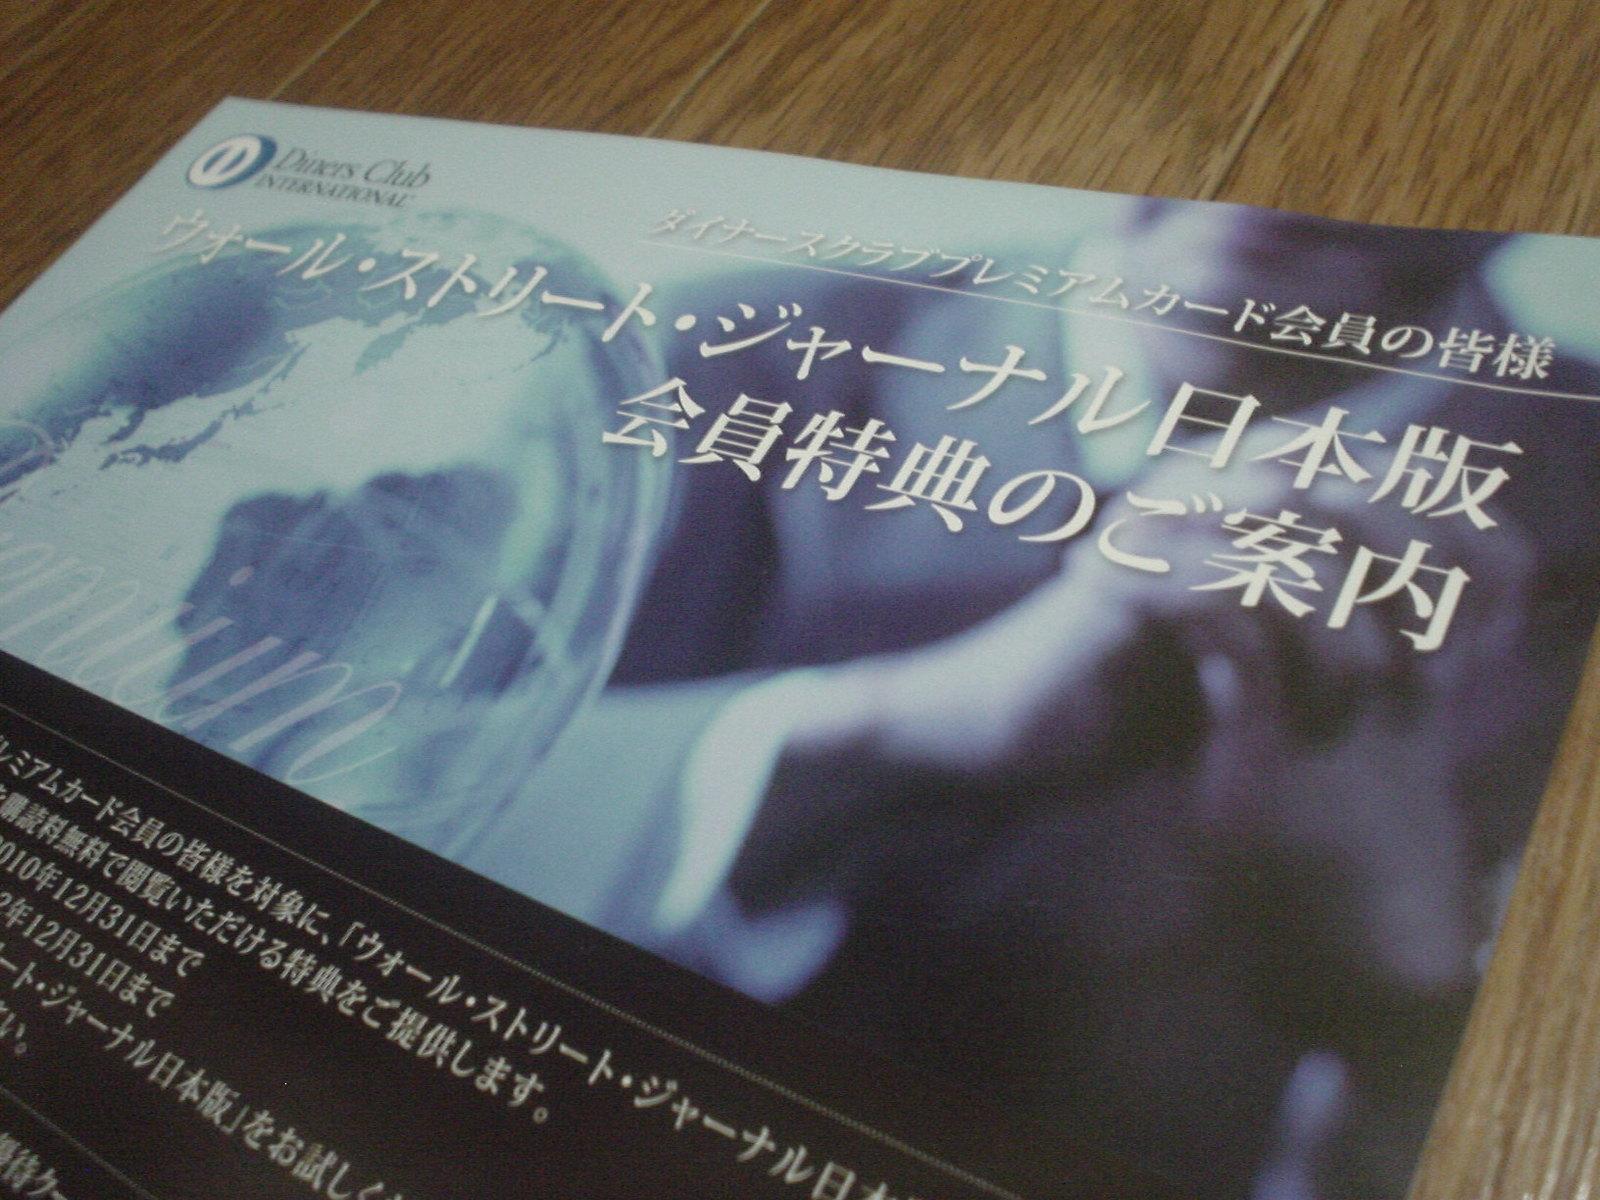 WSJ日本語版特典のチラシ